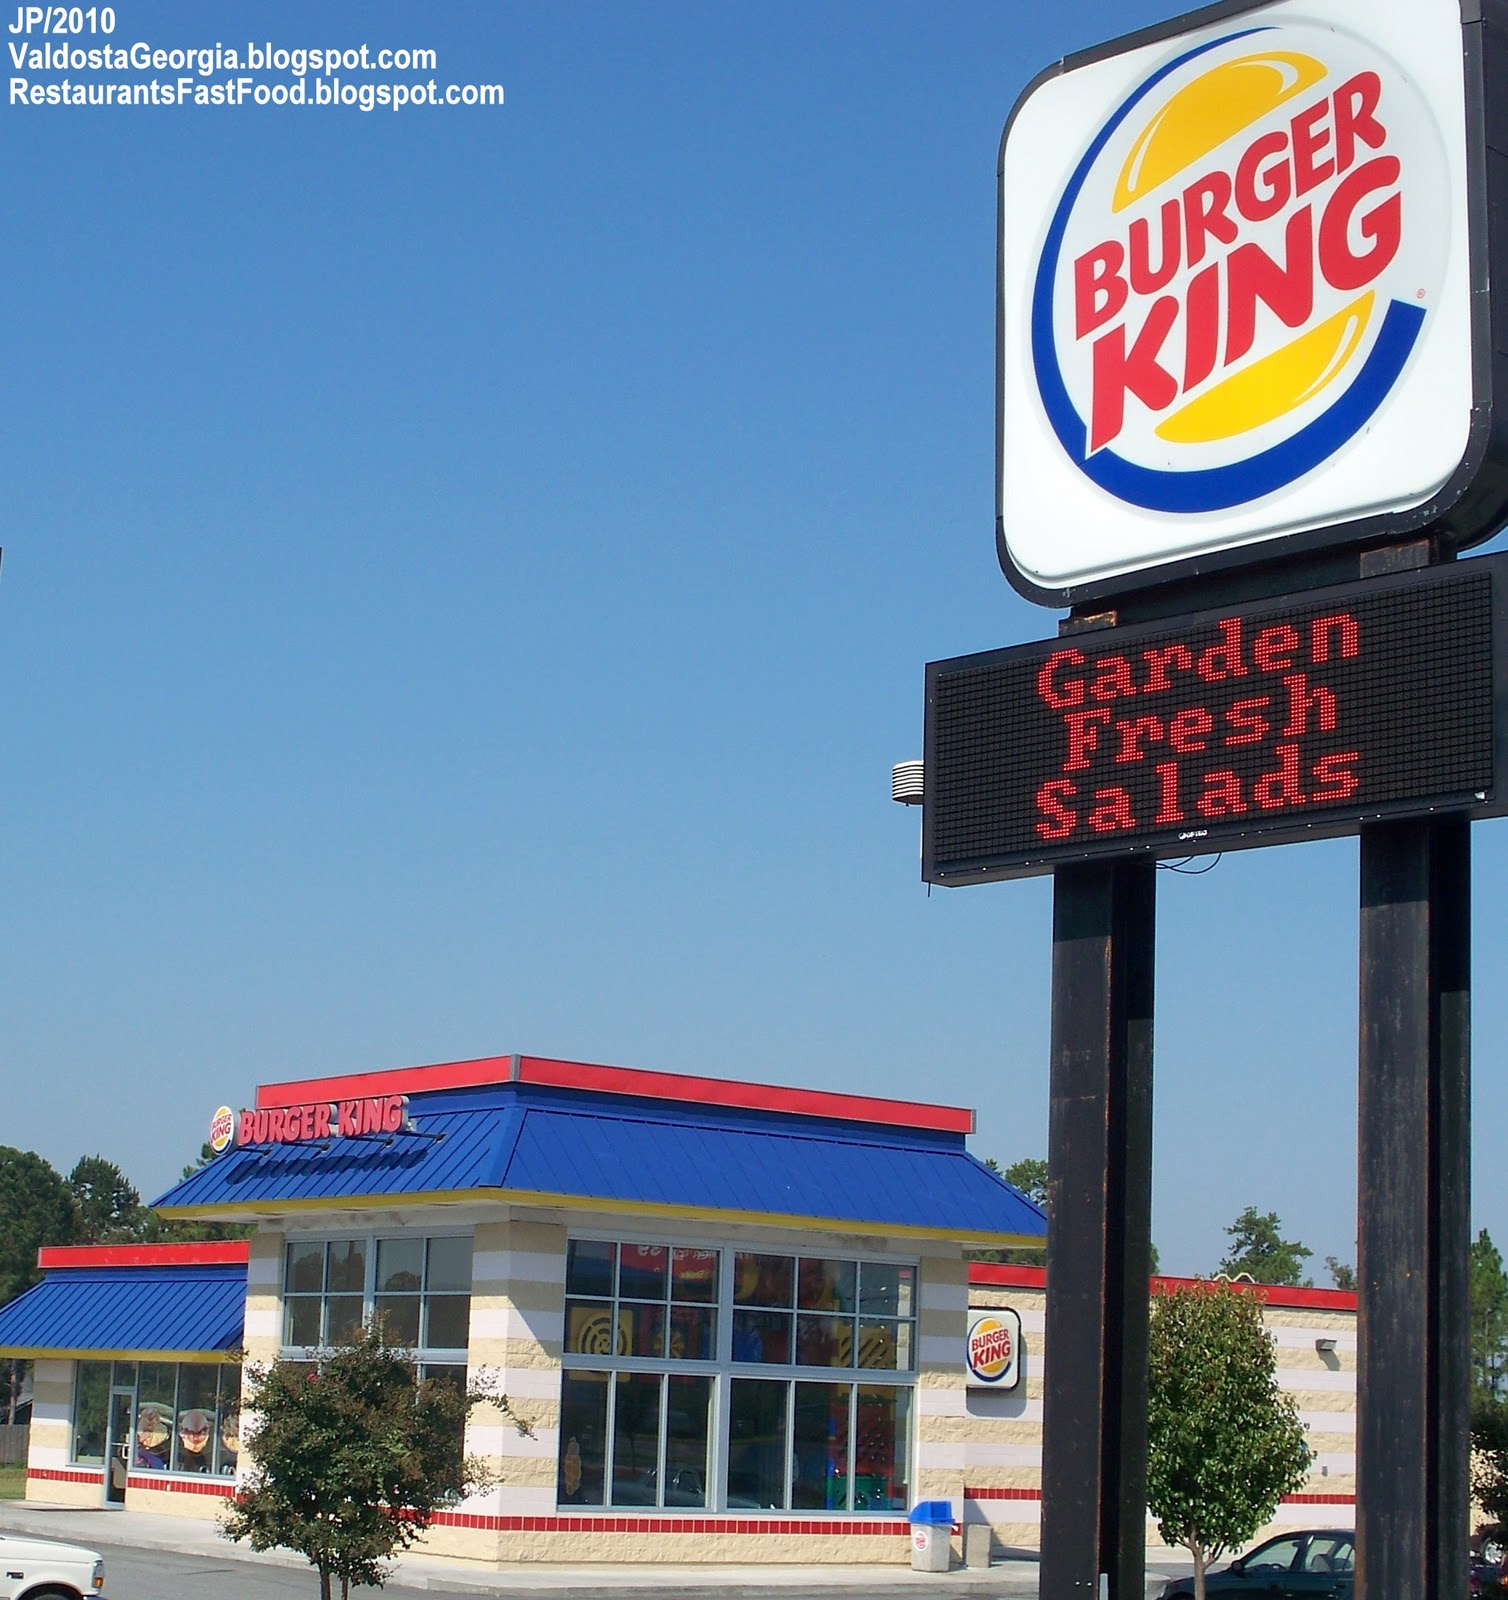 Burger King Valdosta Georgia Shiloh Rd I 75 Fast Food Hamburger Restaurant Ga Menu Mcdonald S Dq Bk Pizza Mexican